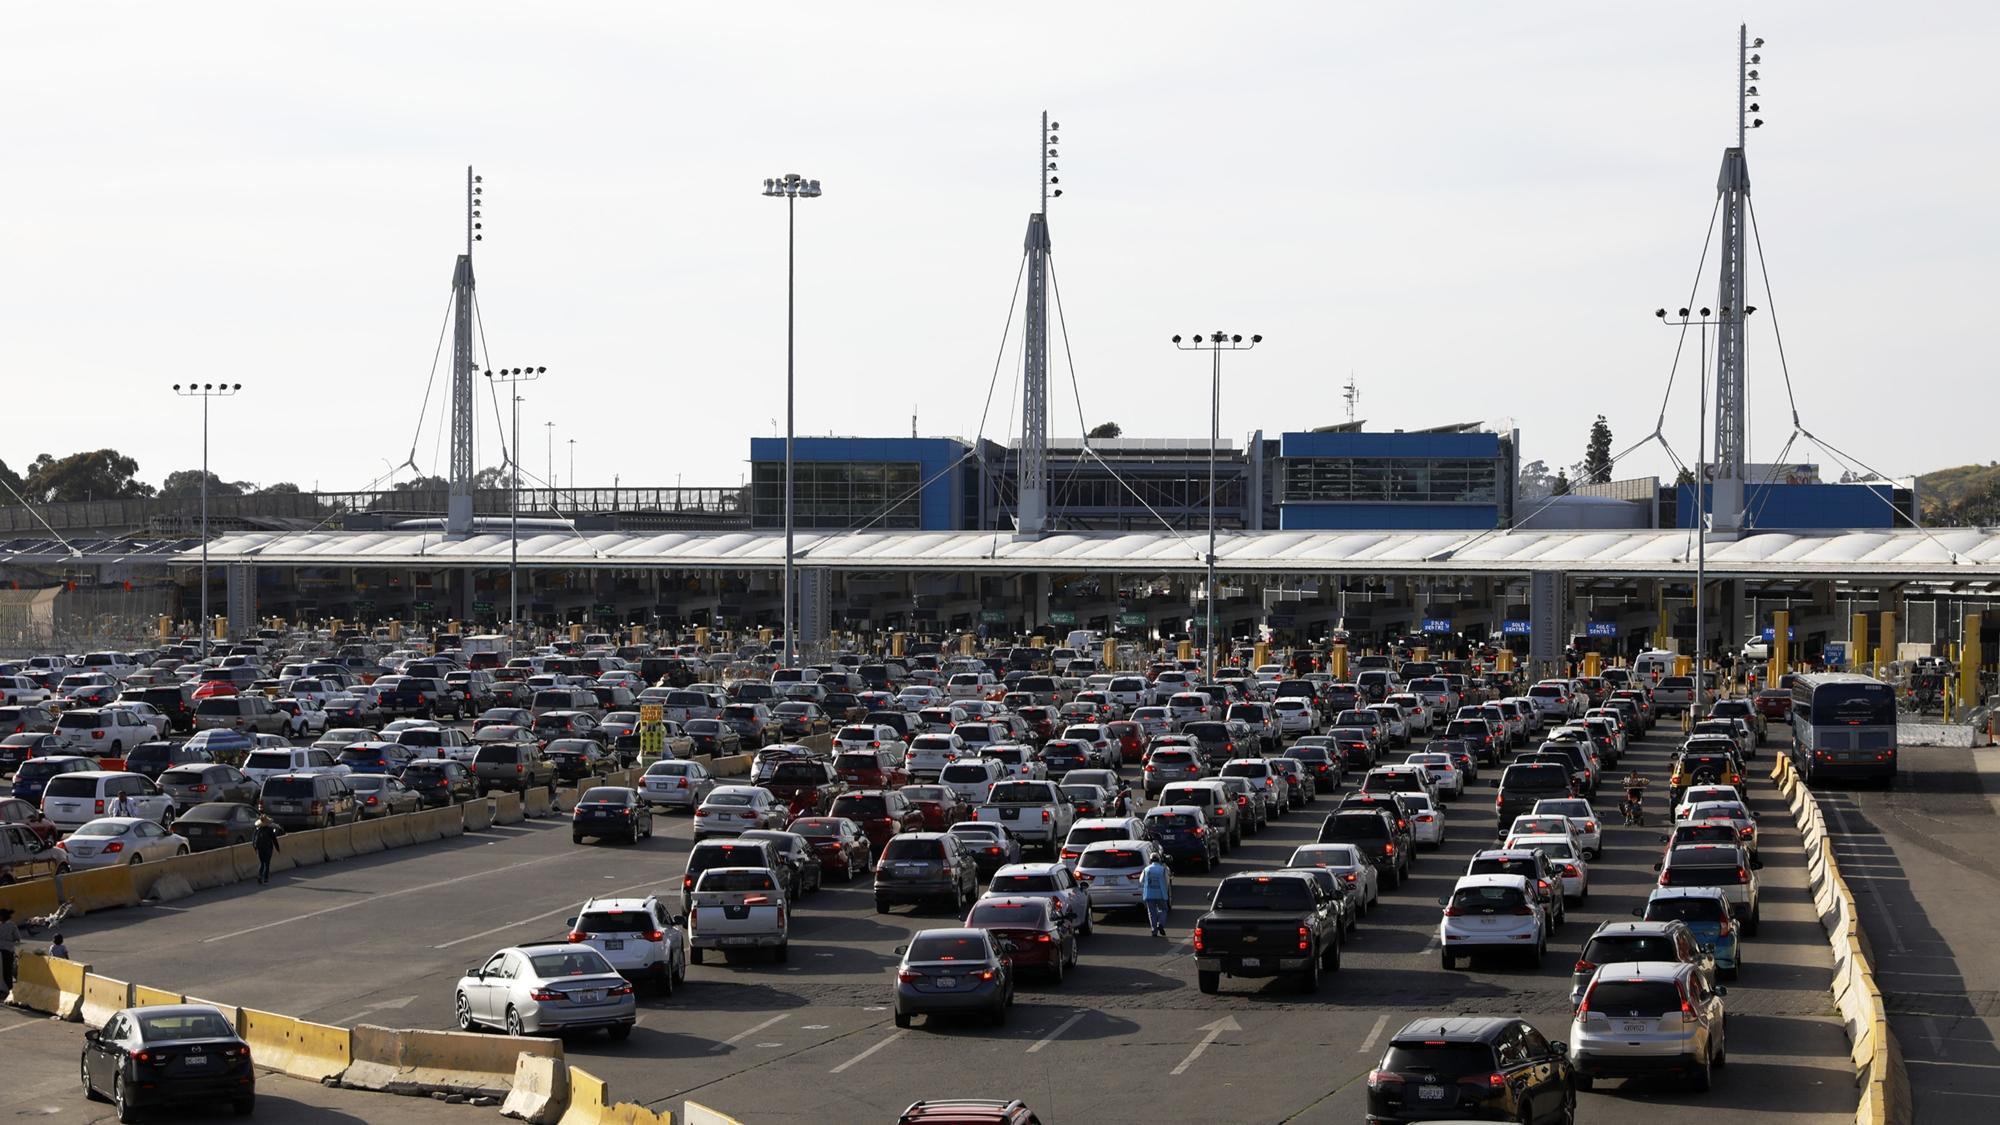 AMLO descarta pérdidas 'significativas' por lentitud en frontera México-EU